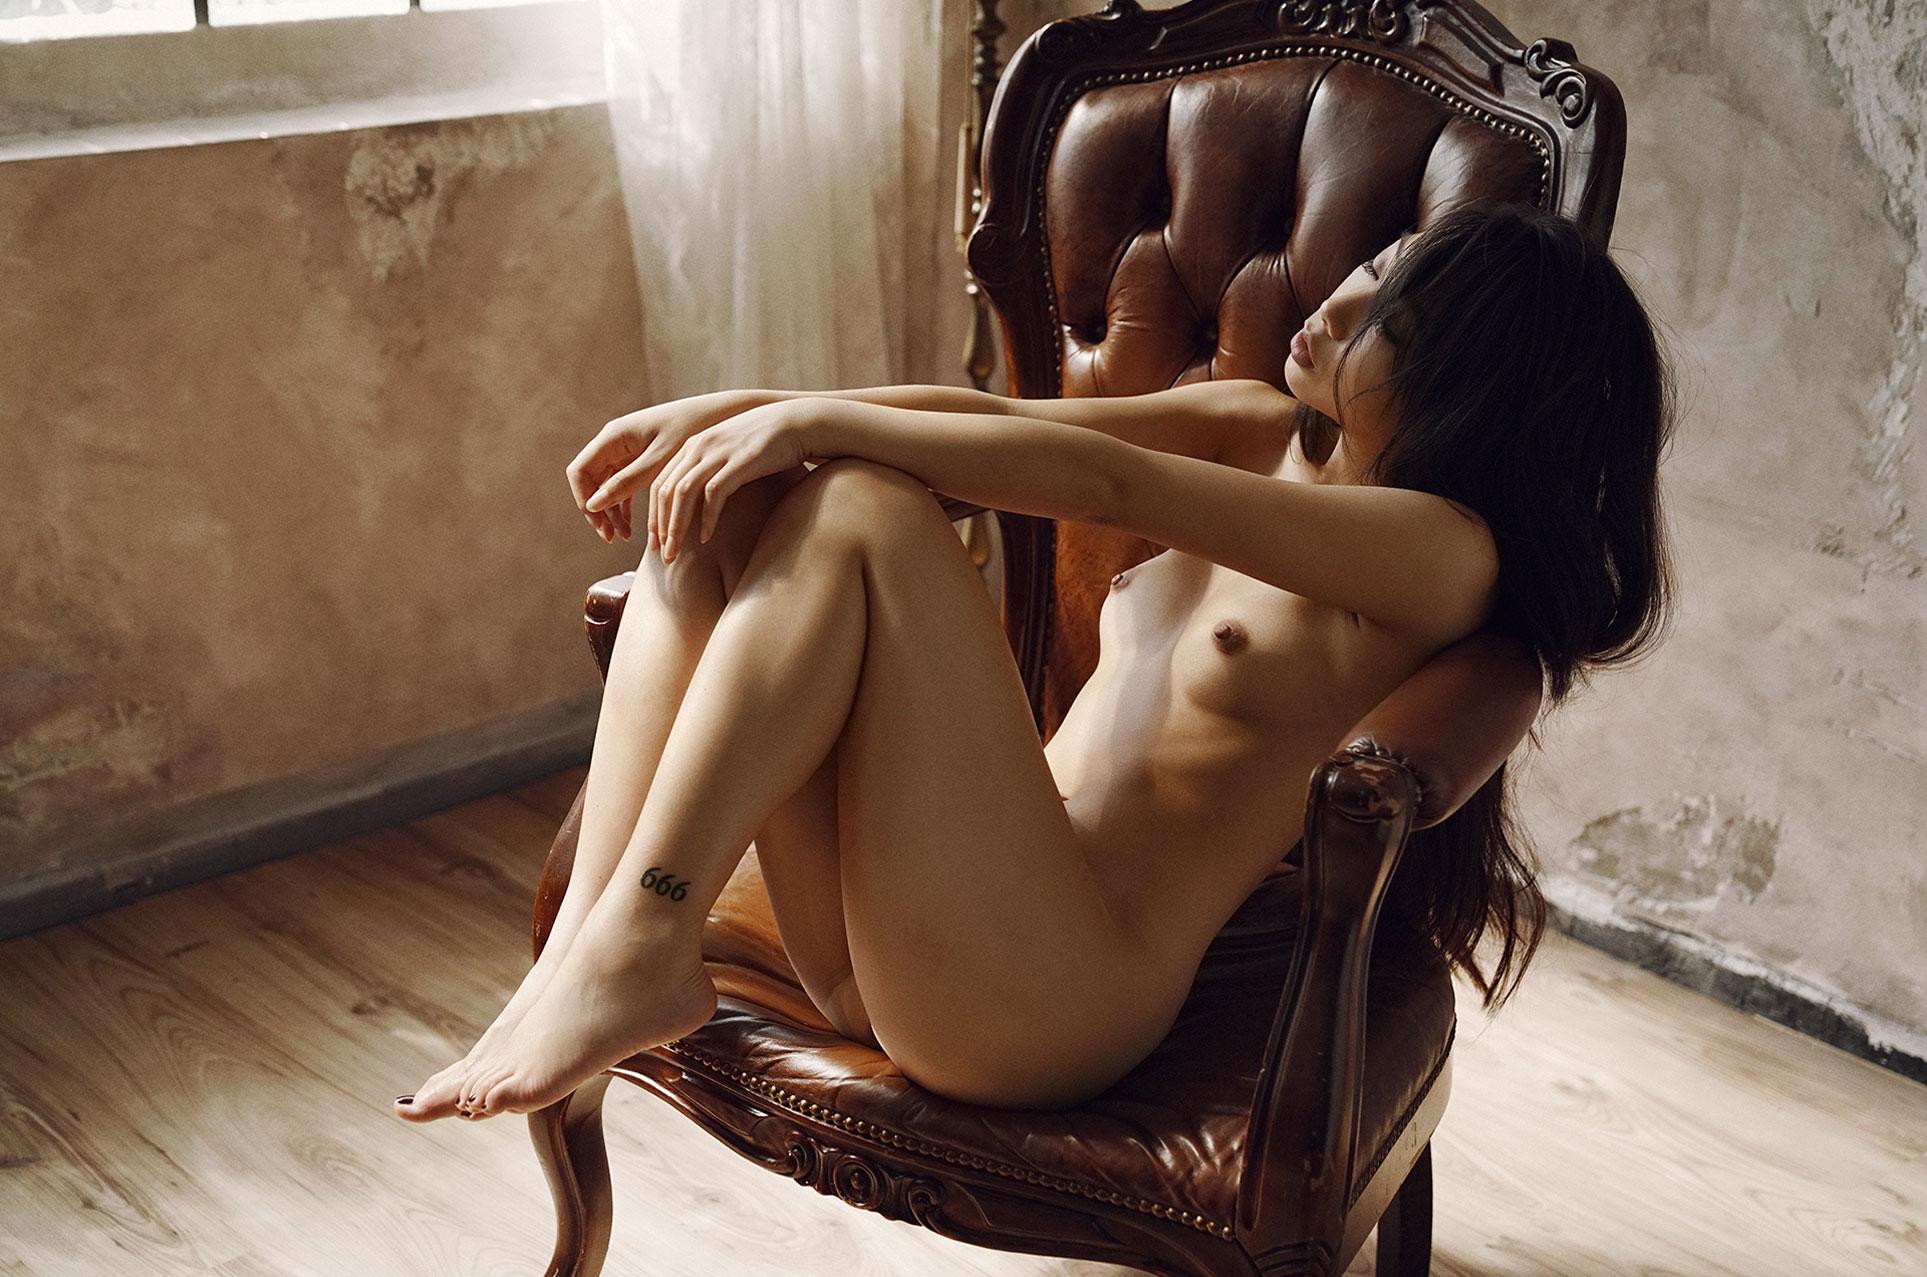 Passion girl / Kim Shinobi nude by Alex Heitz